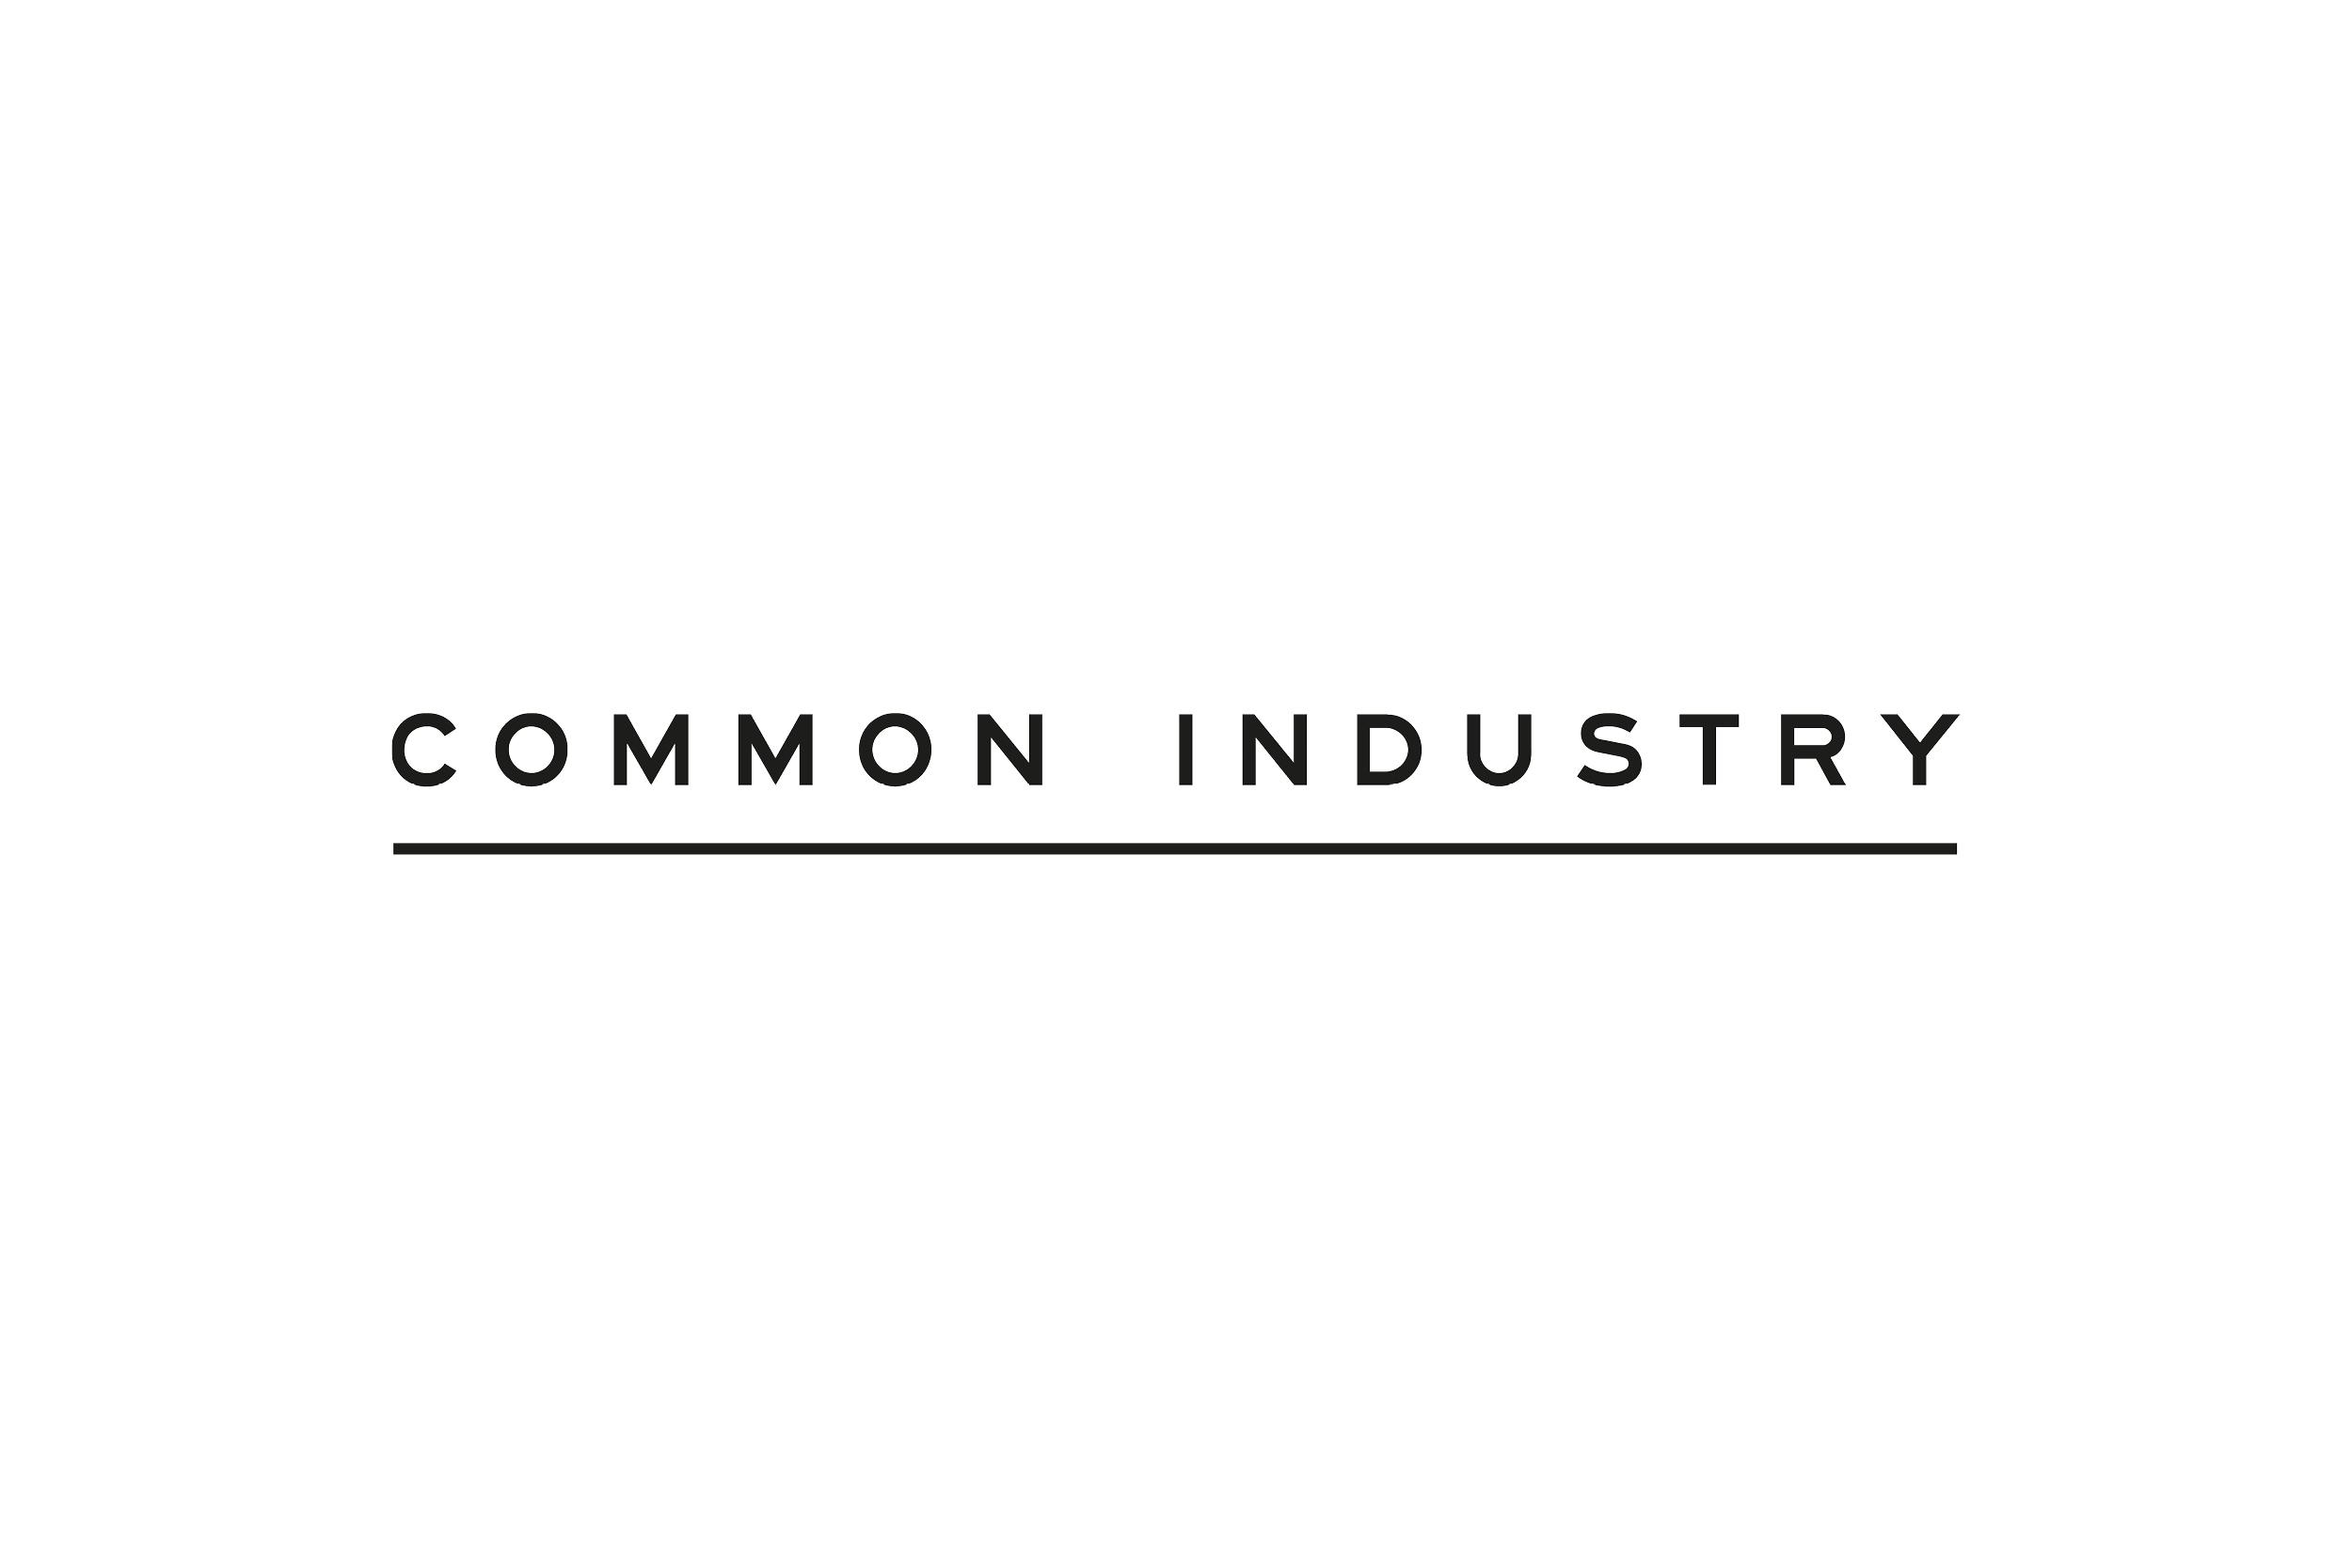 Common Industry